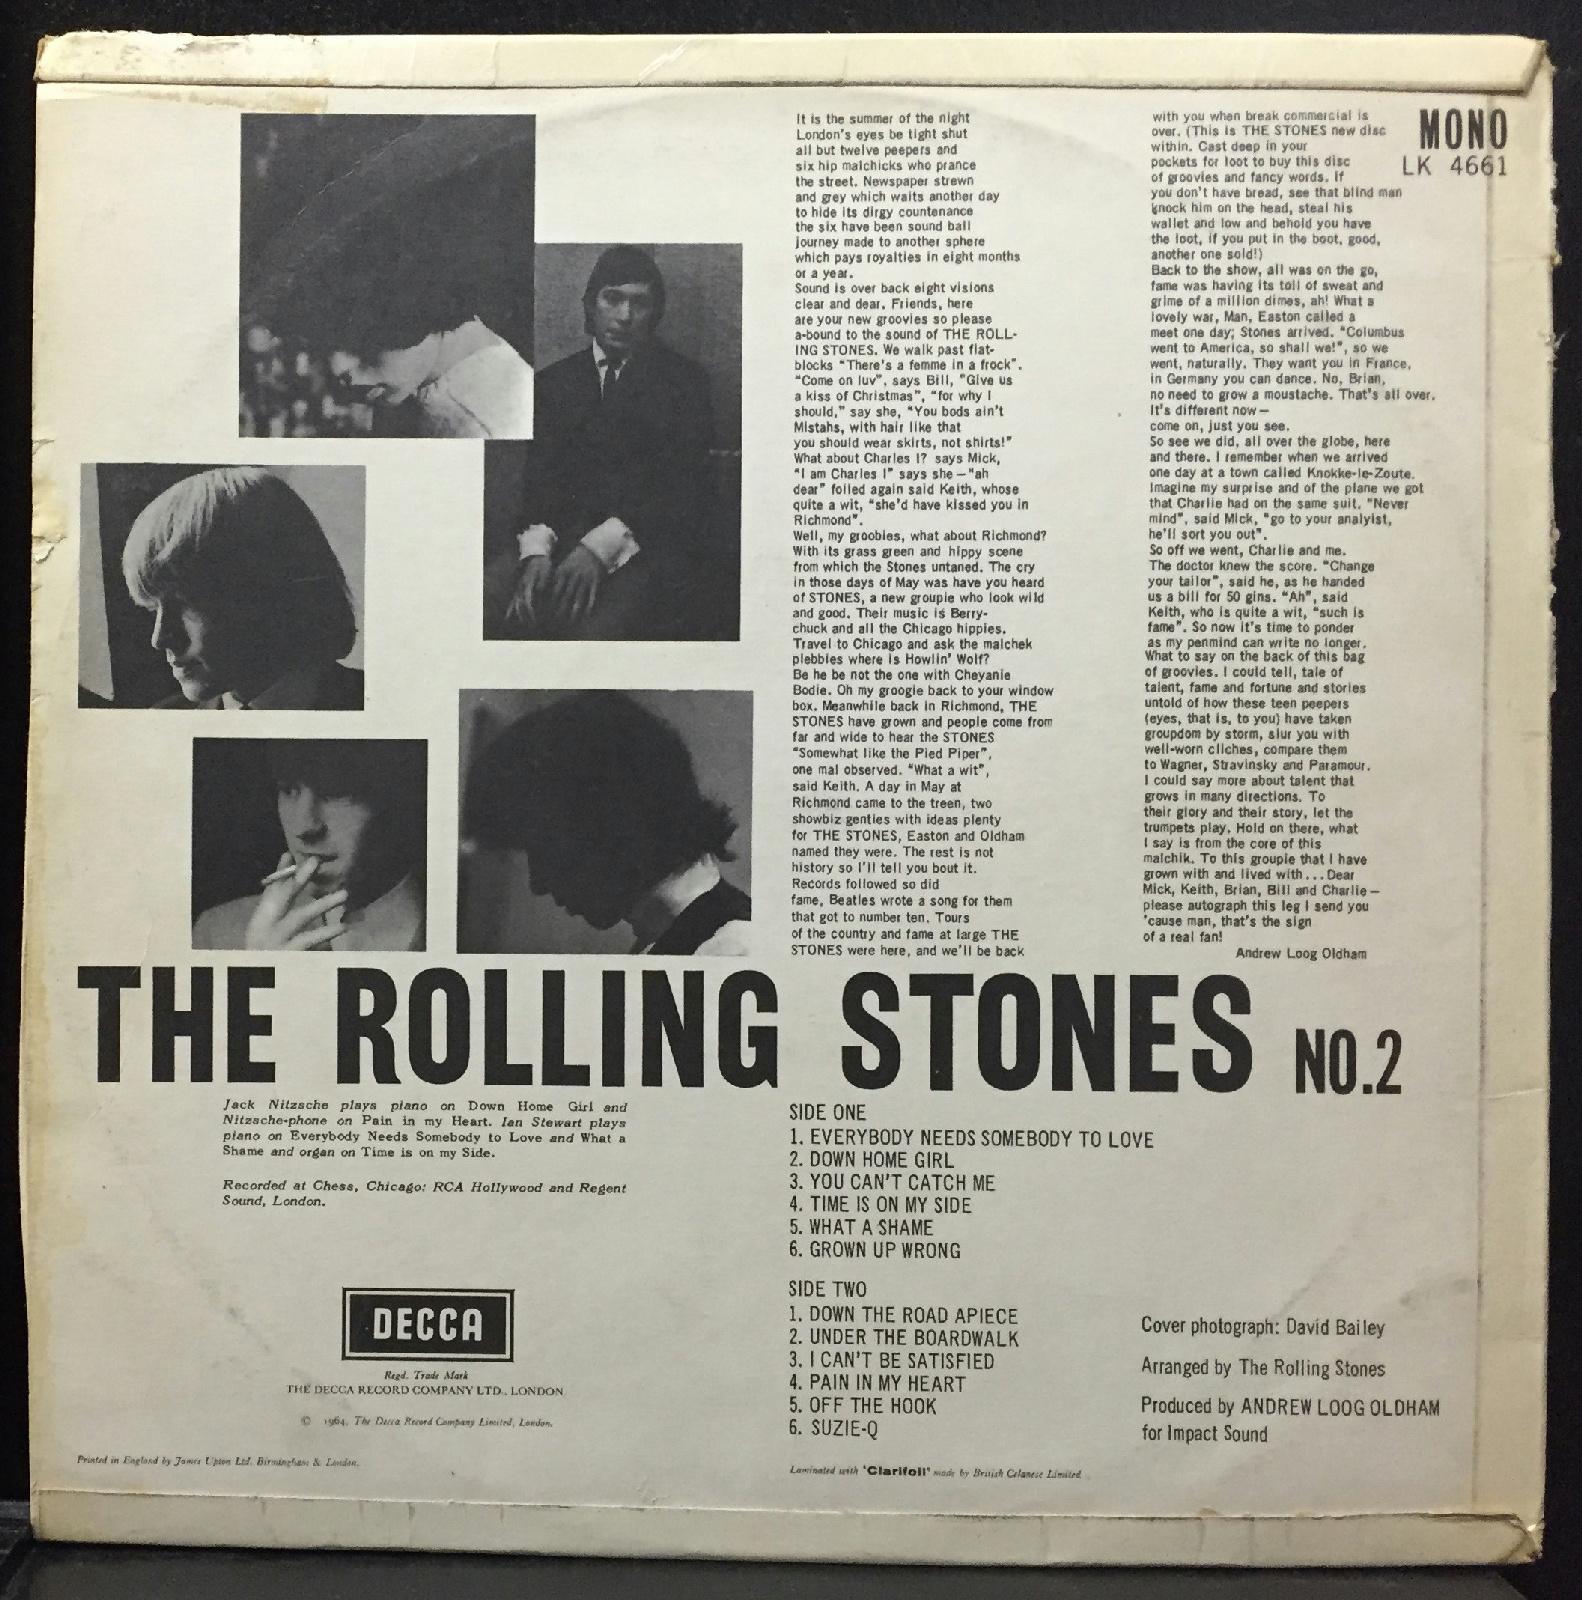 Rolling Stones No 2 Lp Vg Mono Uk Decca Lk 4661 Original